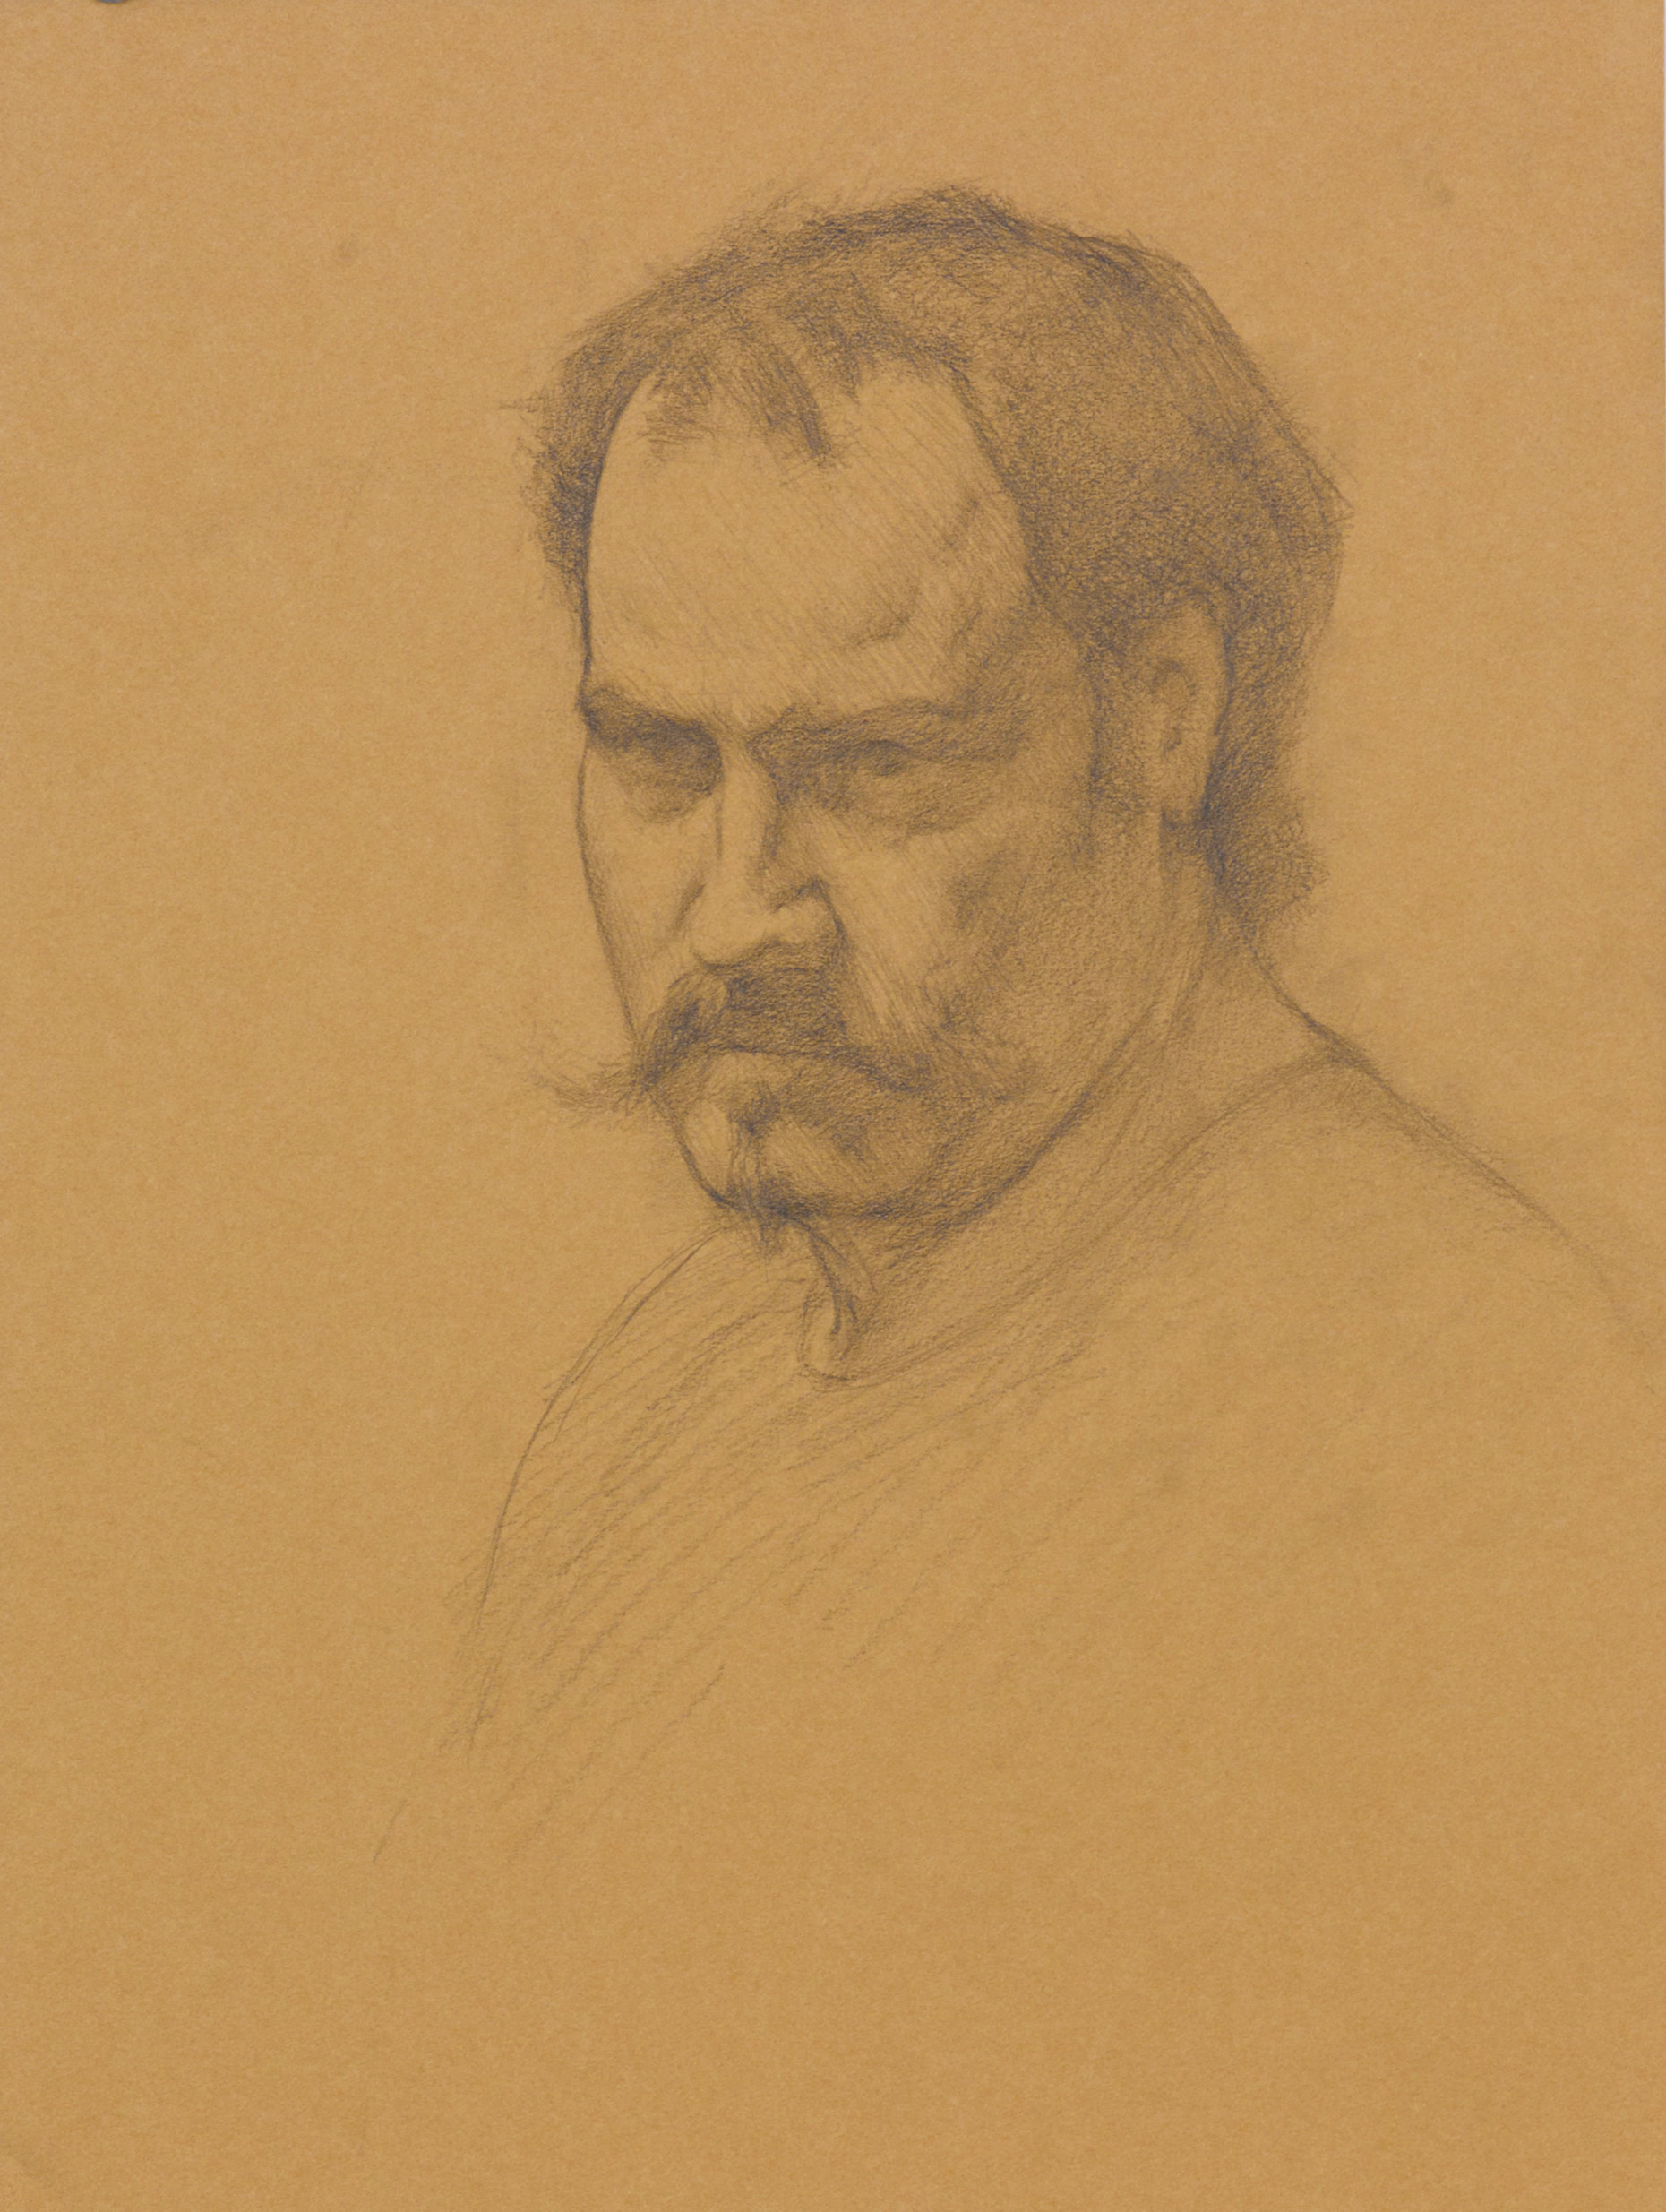 Portrait of a Man. 9x12. Graphite on toned paper.